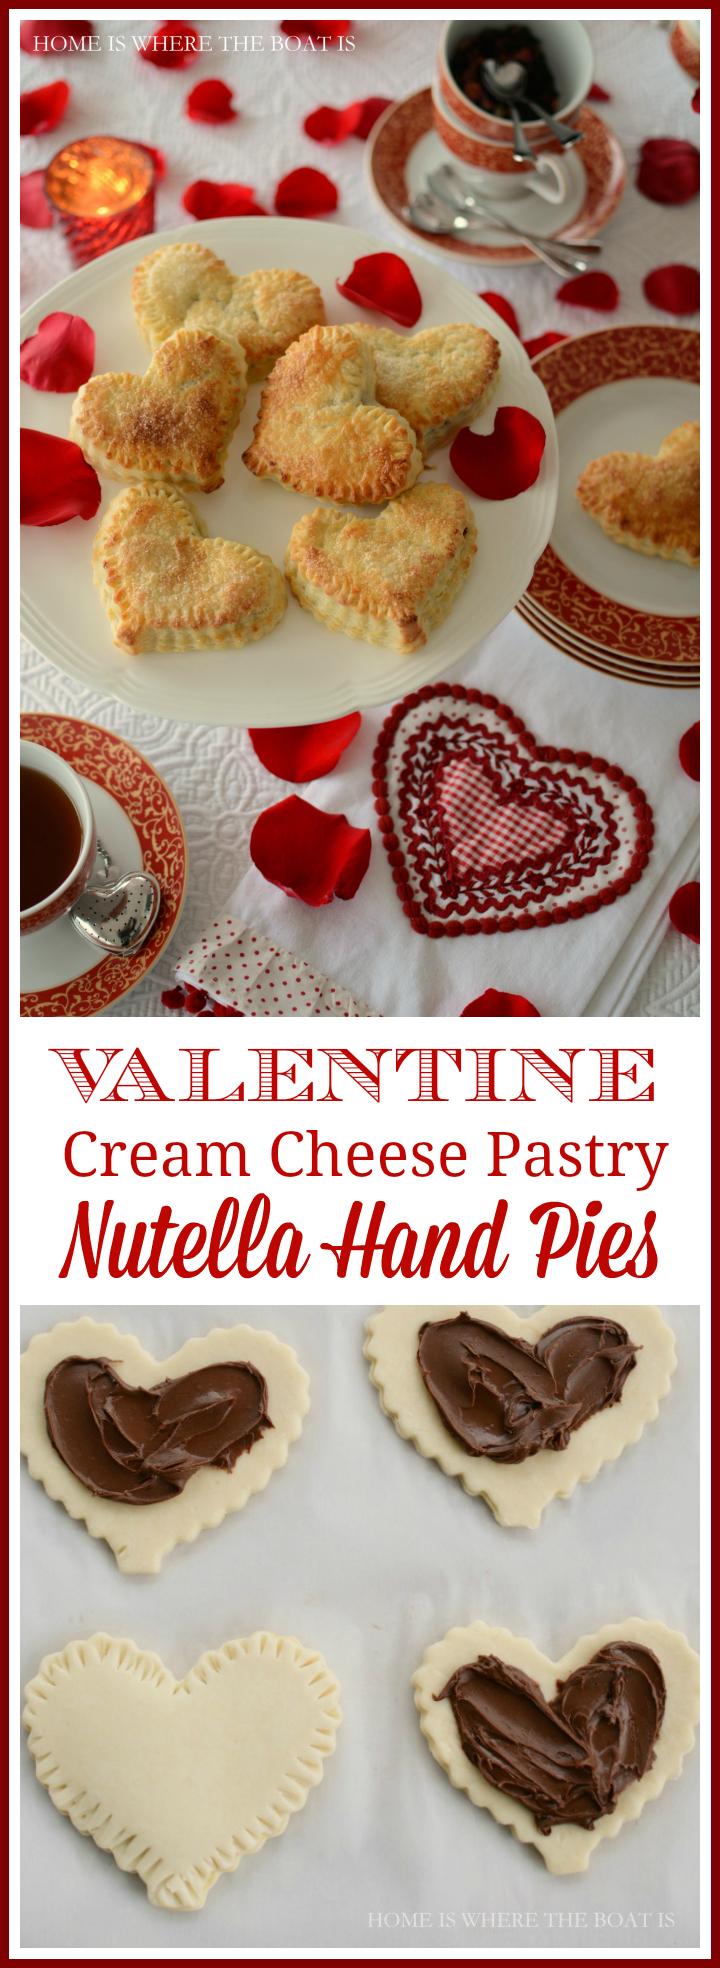 Valentine Cream Cheese Pastry Nutella Hand Pies